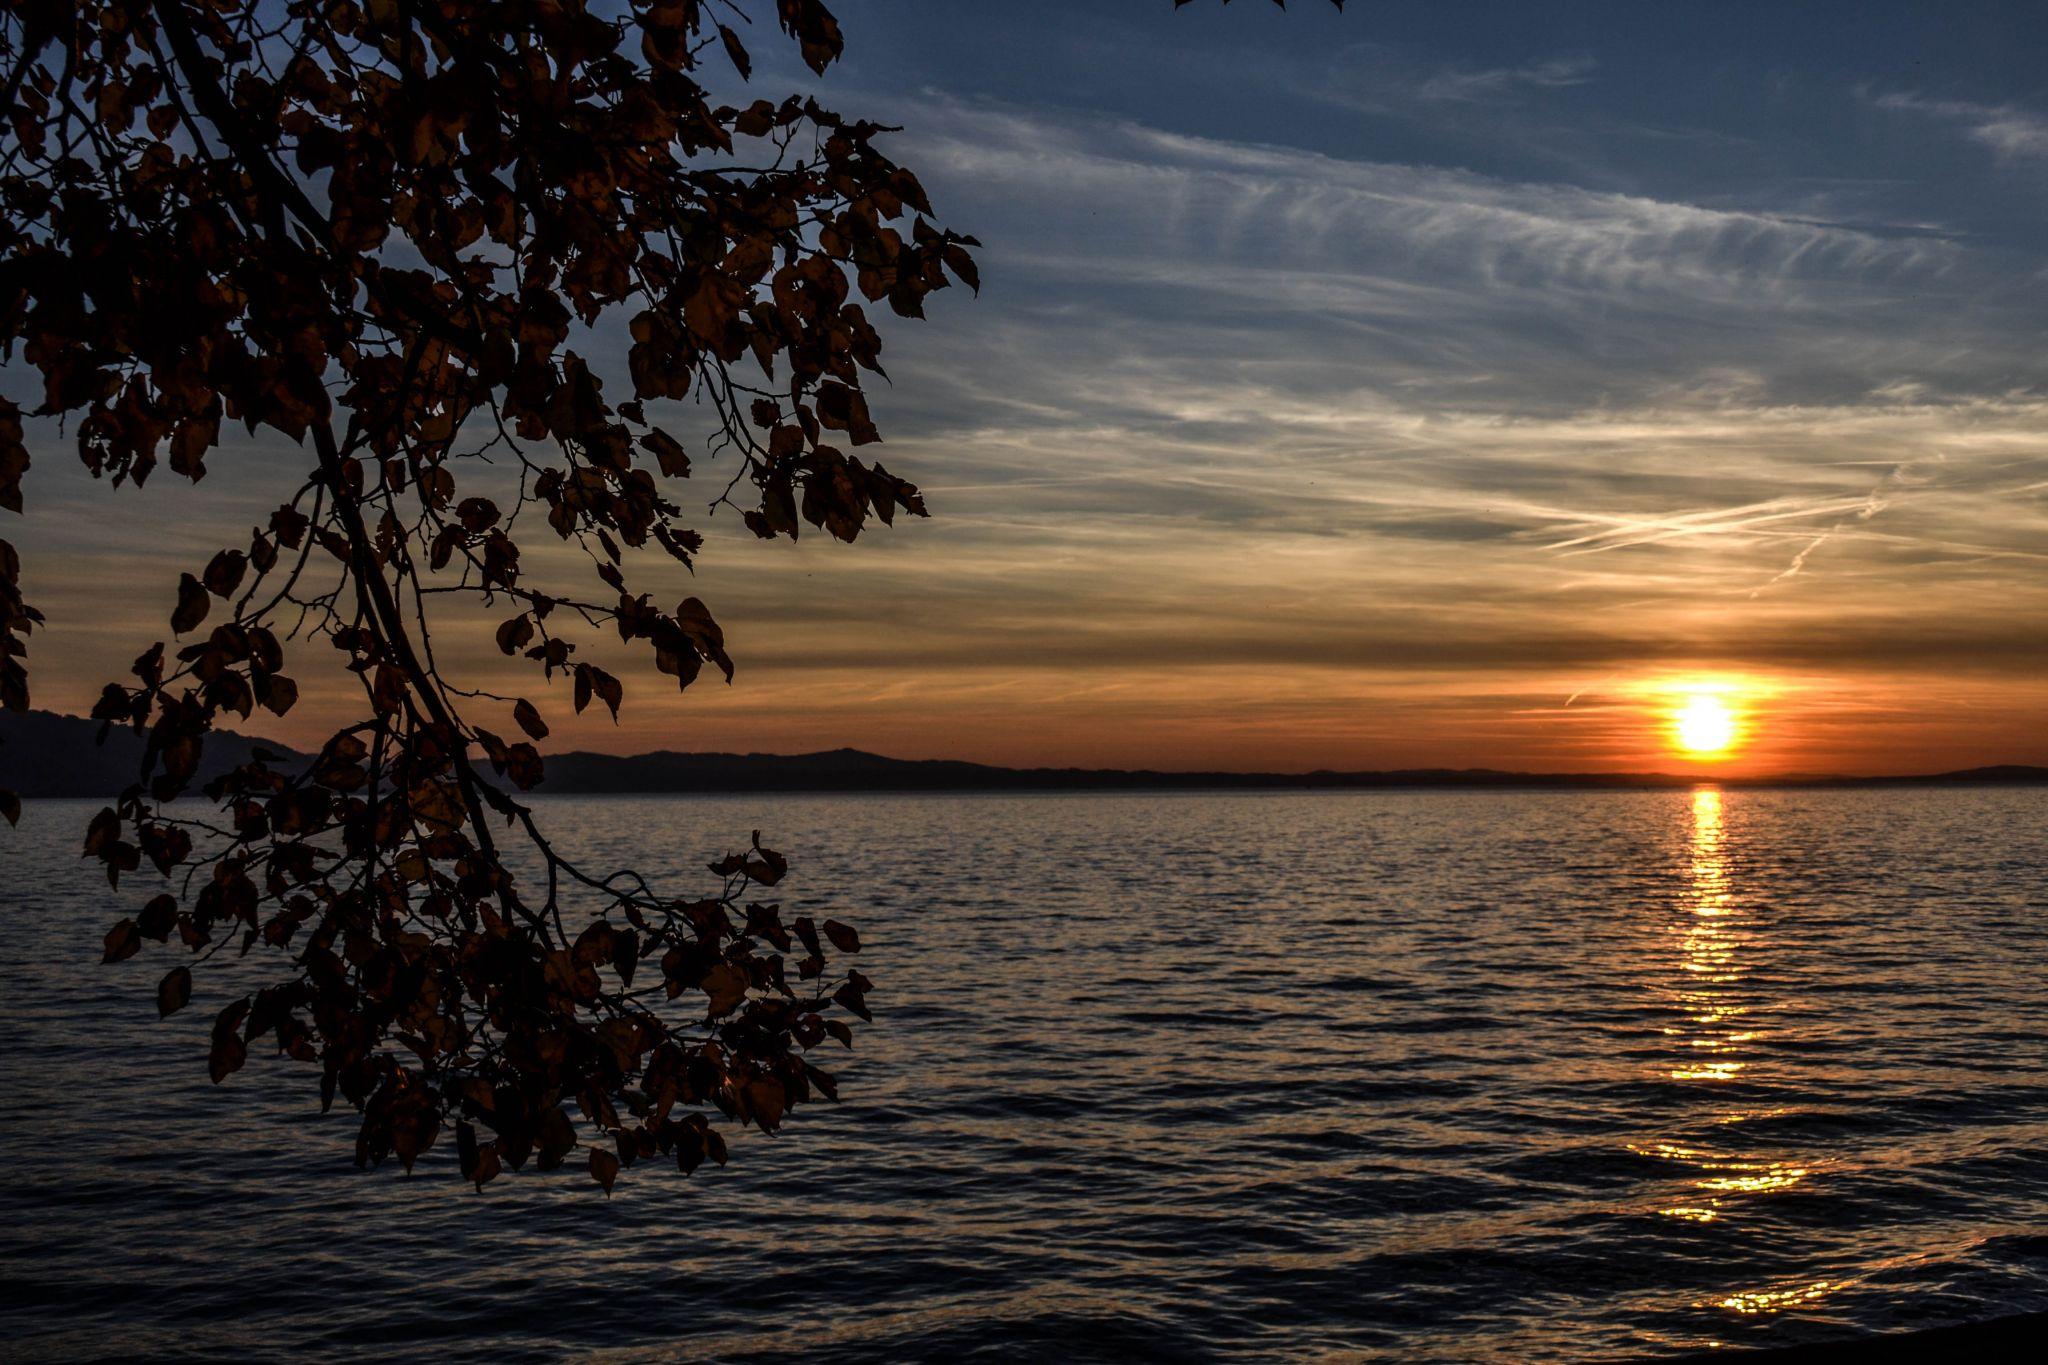 Lindau am Bodensee - Germany, Lake Constance, Germany